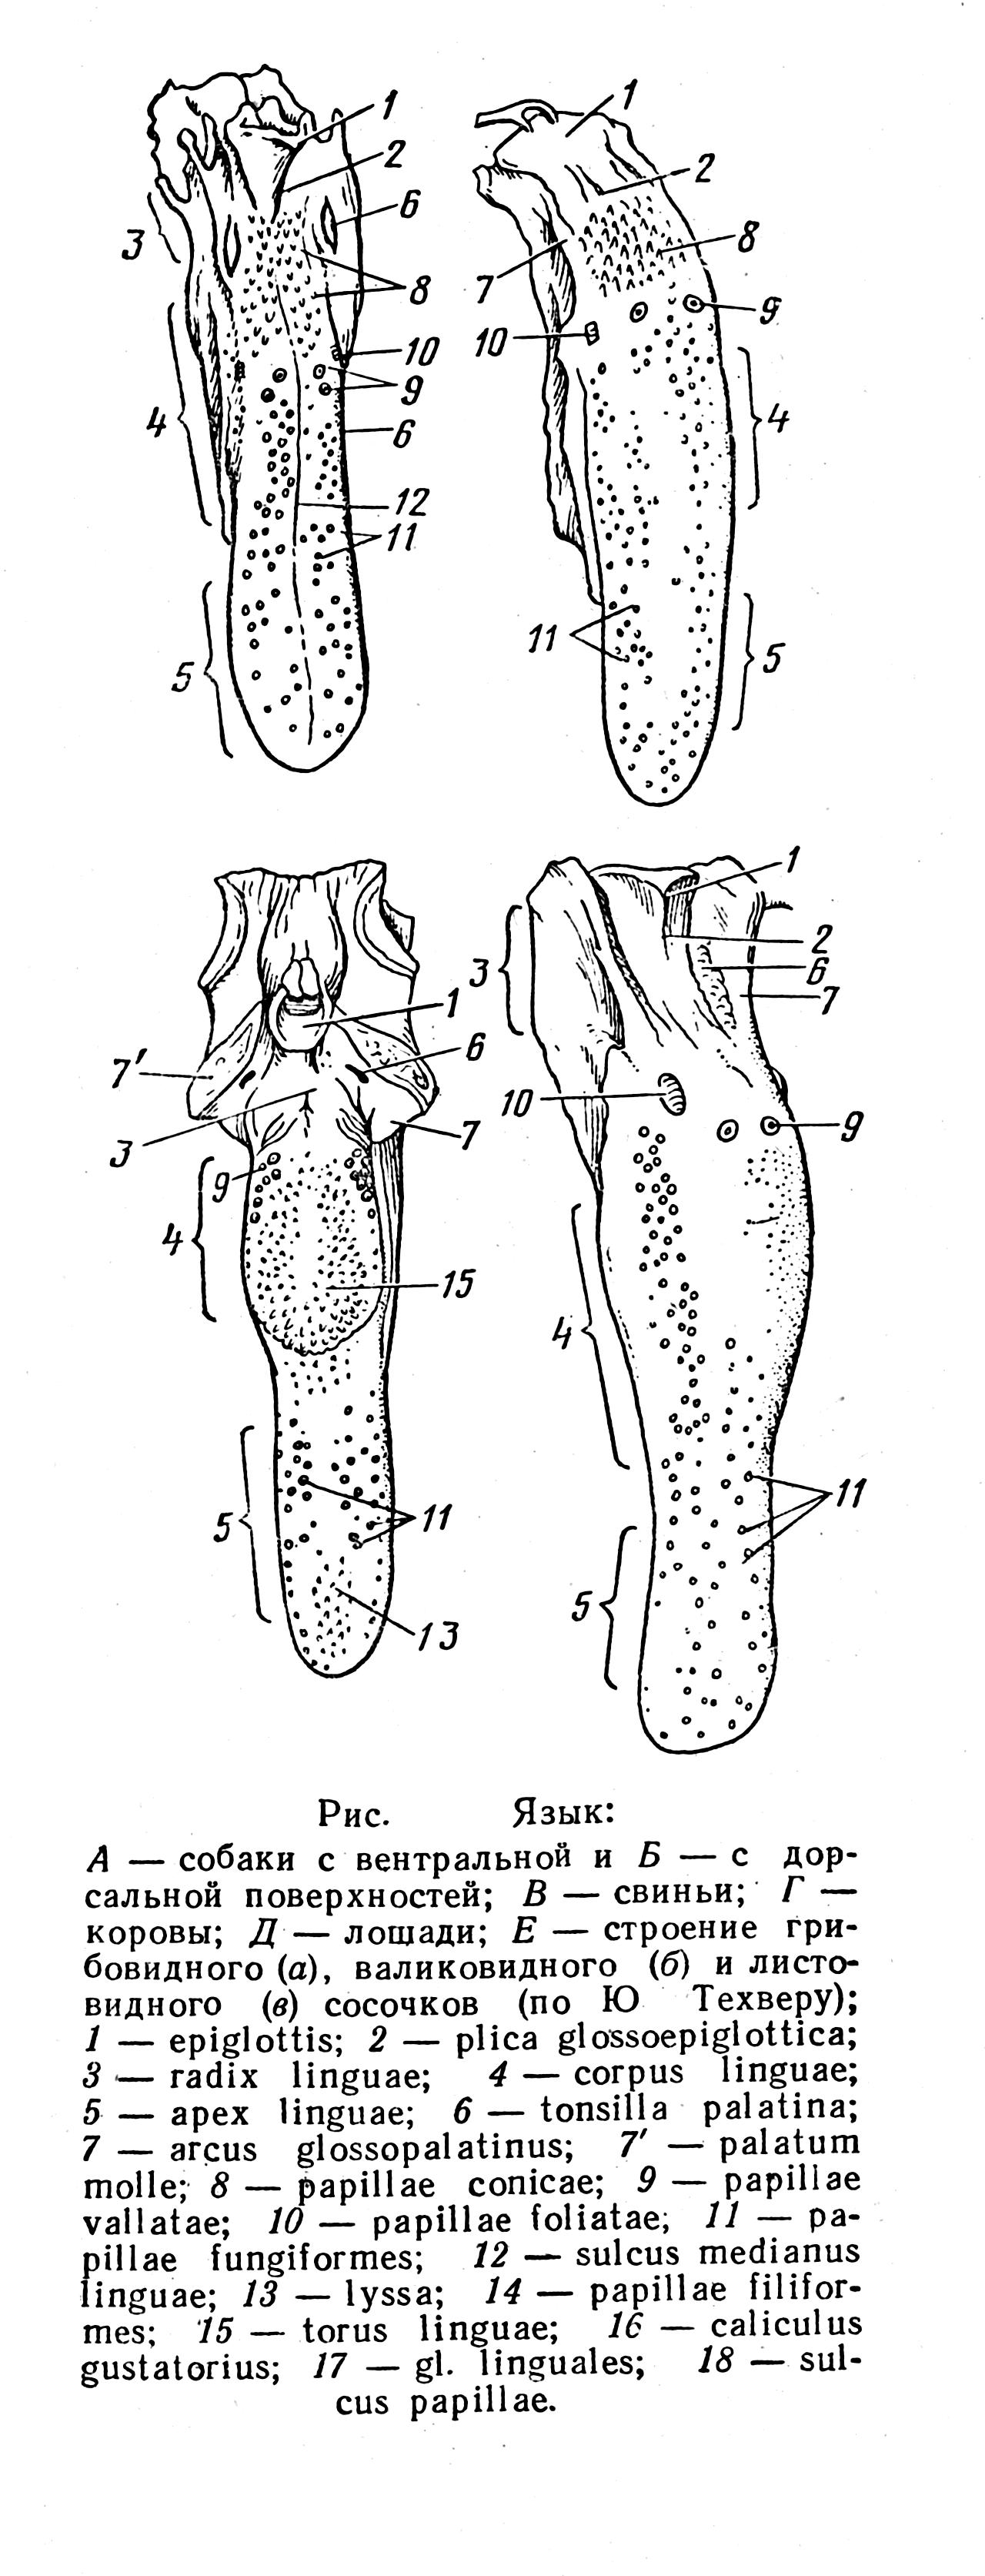 Мышцы плечевого сустава животных